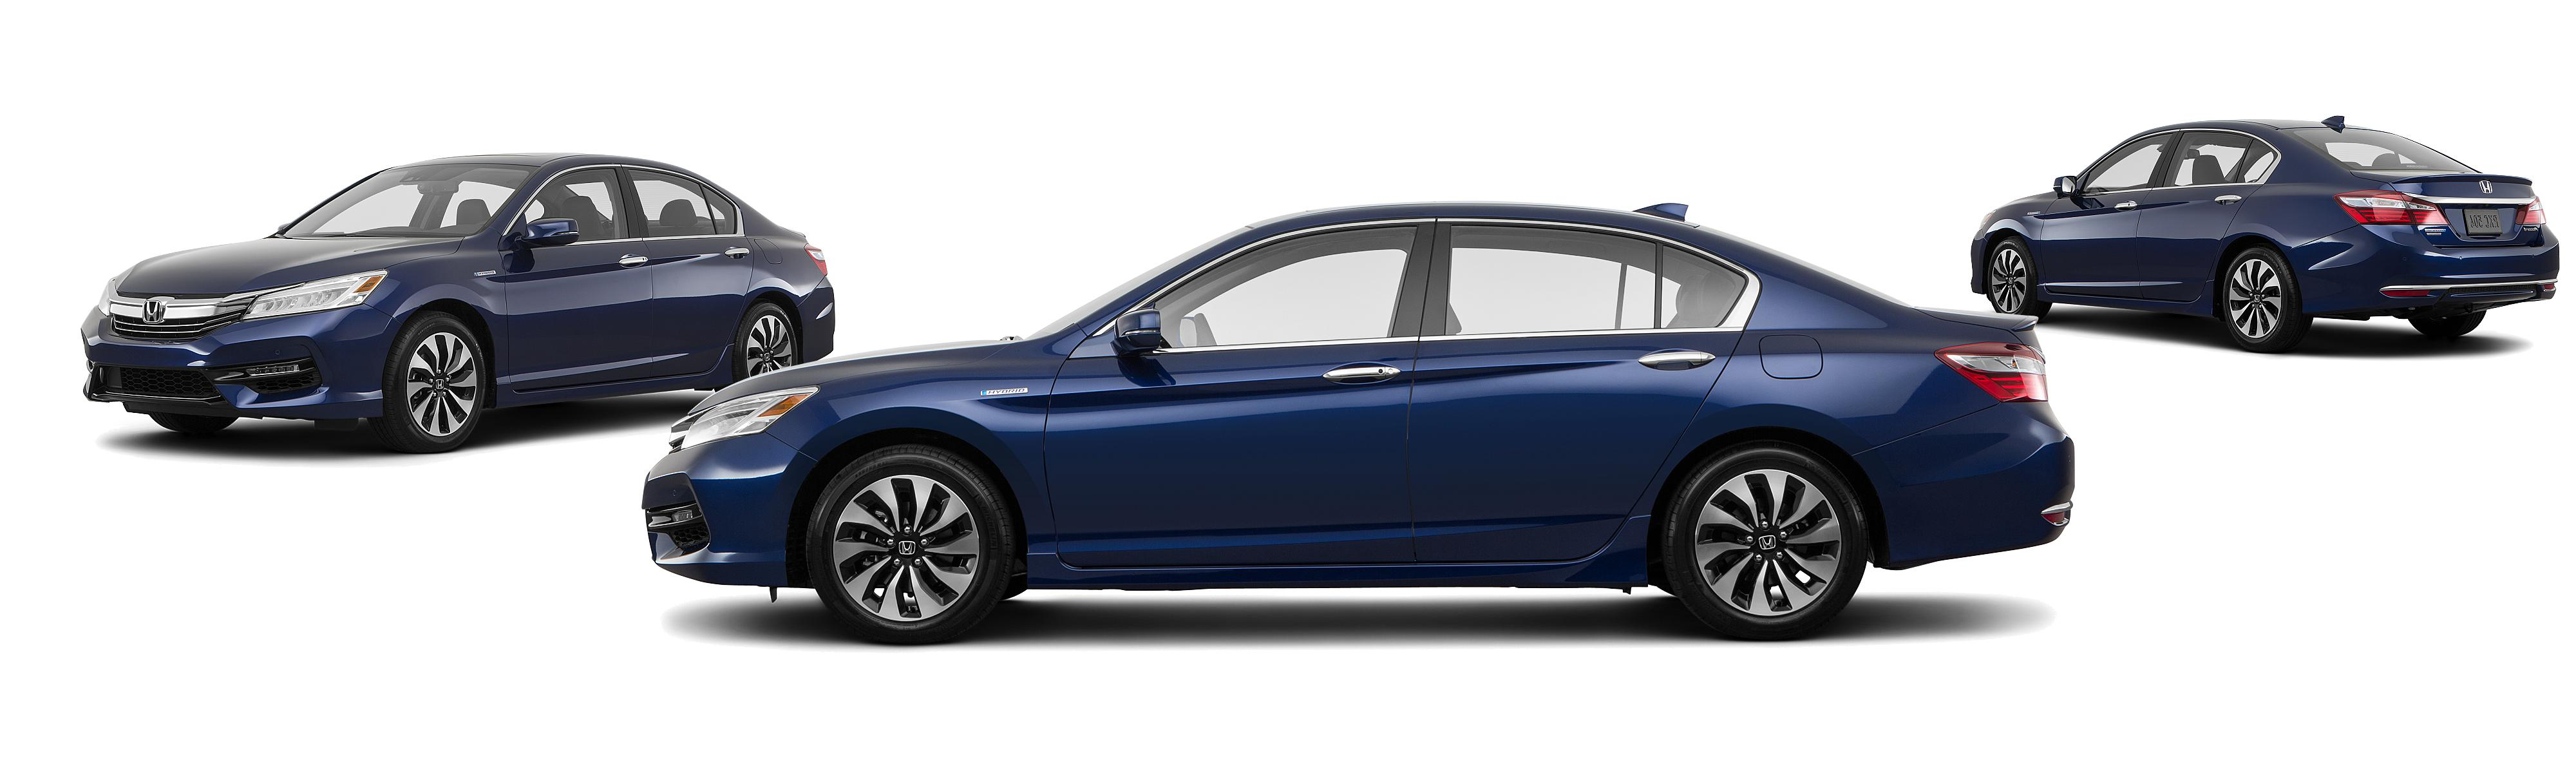 2017 Honda Accord Hybrid Base 4dr Sedan Research GrooveCar